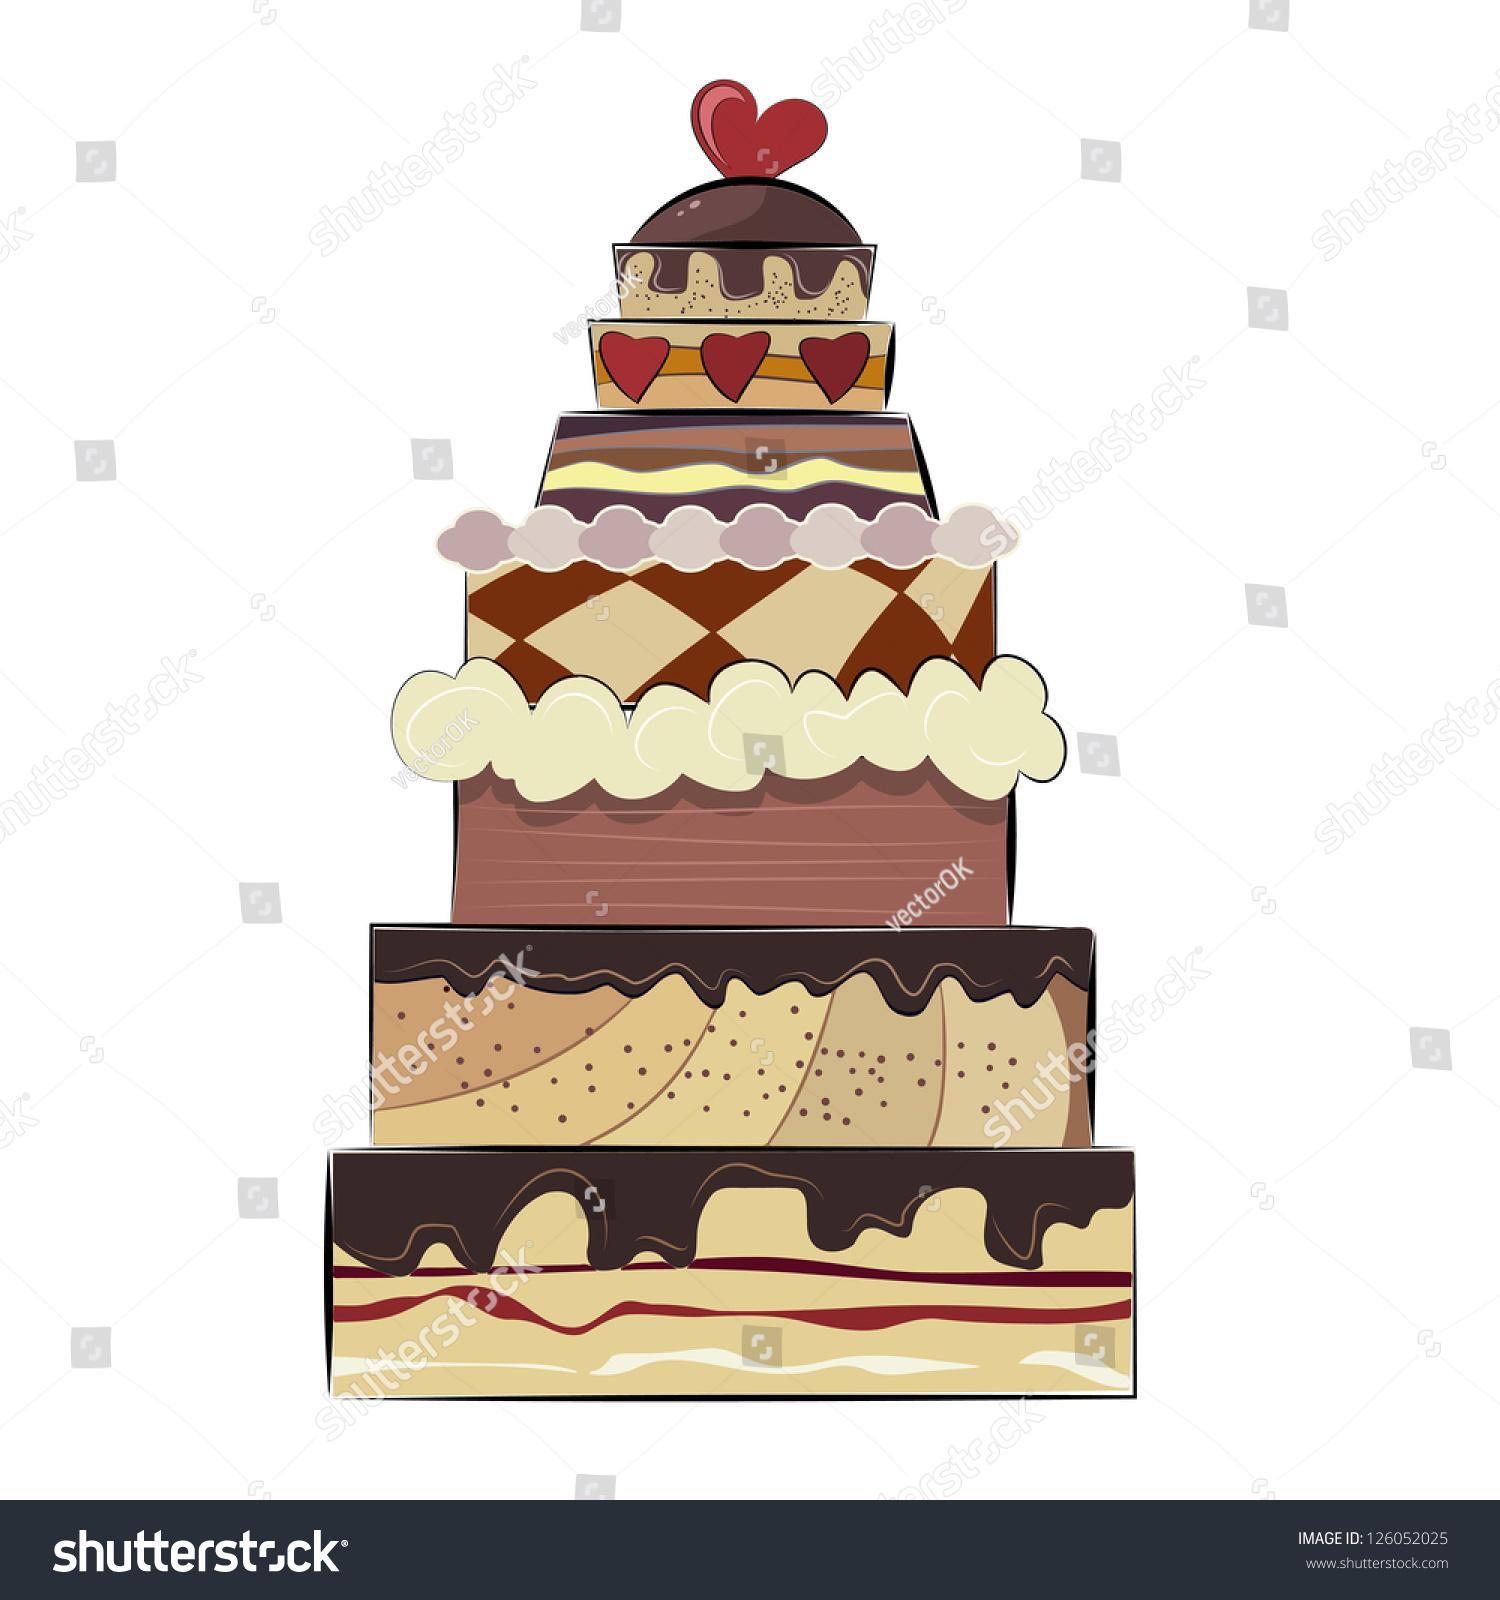 Big Birthday Cake Stock Vector 126052025 Shutterstock